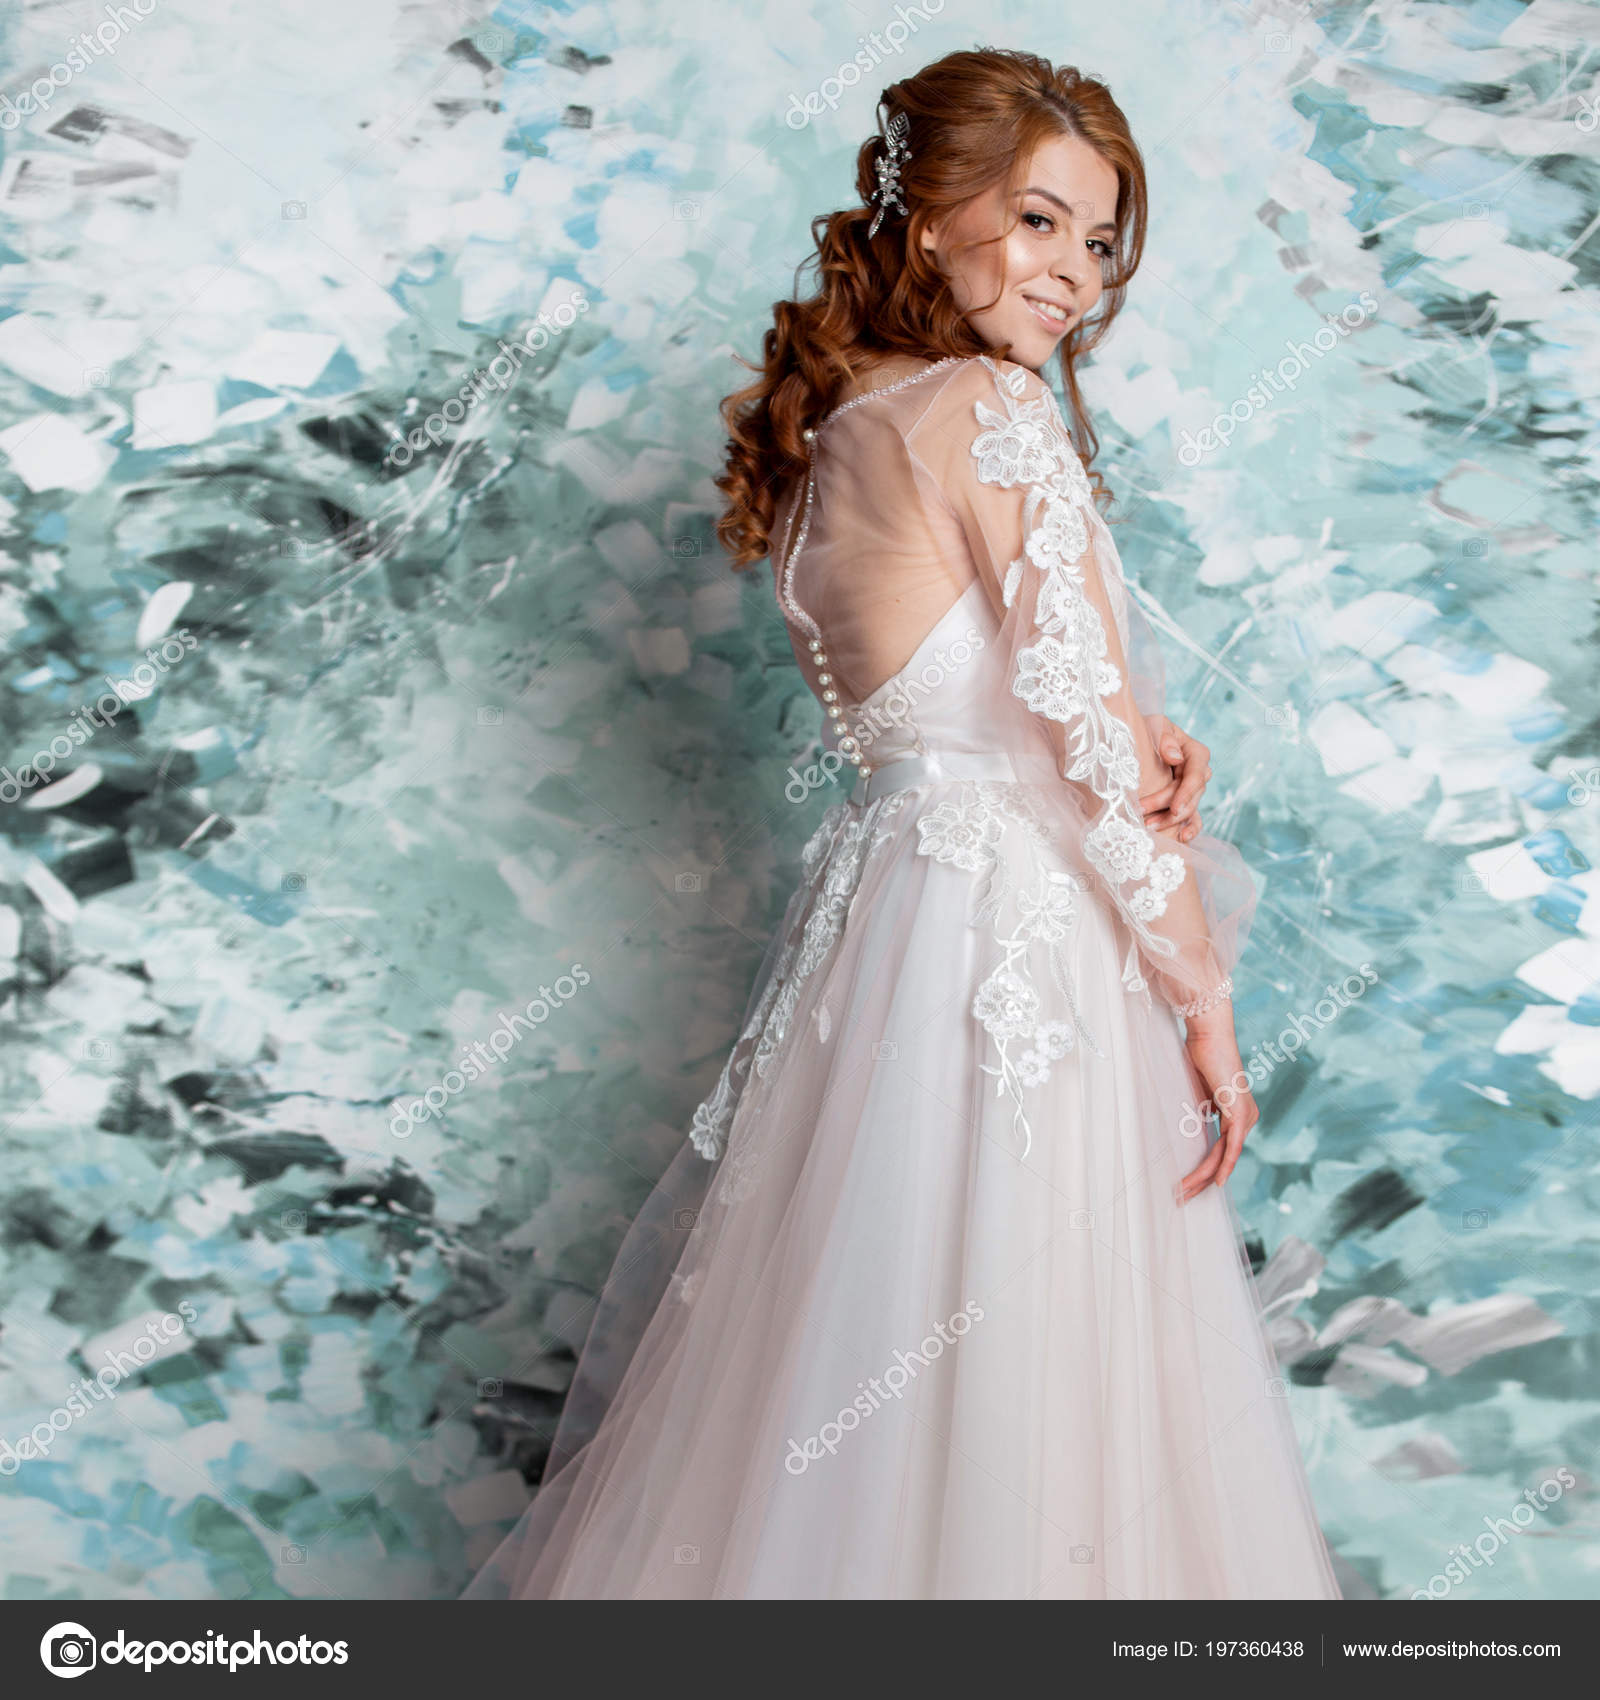 5493615d040 Όμορφο και ρομαντικό νύφη στο γάμο φόρεμα με μακριά μανίκια. Νεαρή γυναίκα  redheaded στο νυφικό, αφηρημένο μπλε φόντο — Εικόνα από ...